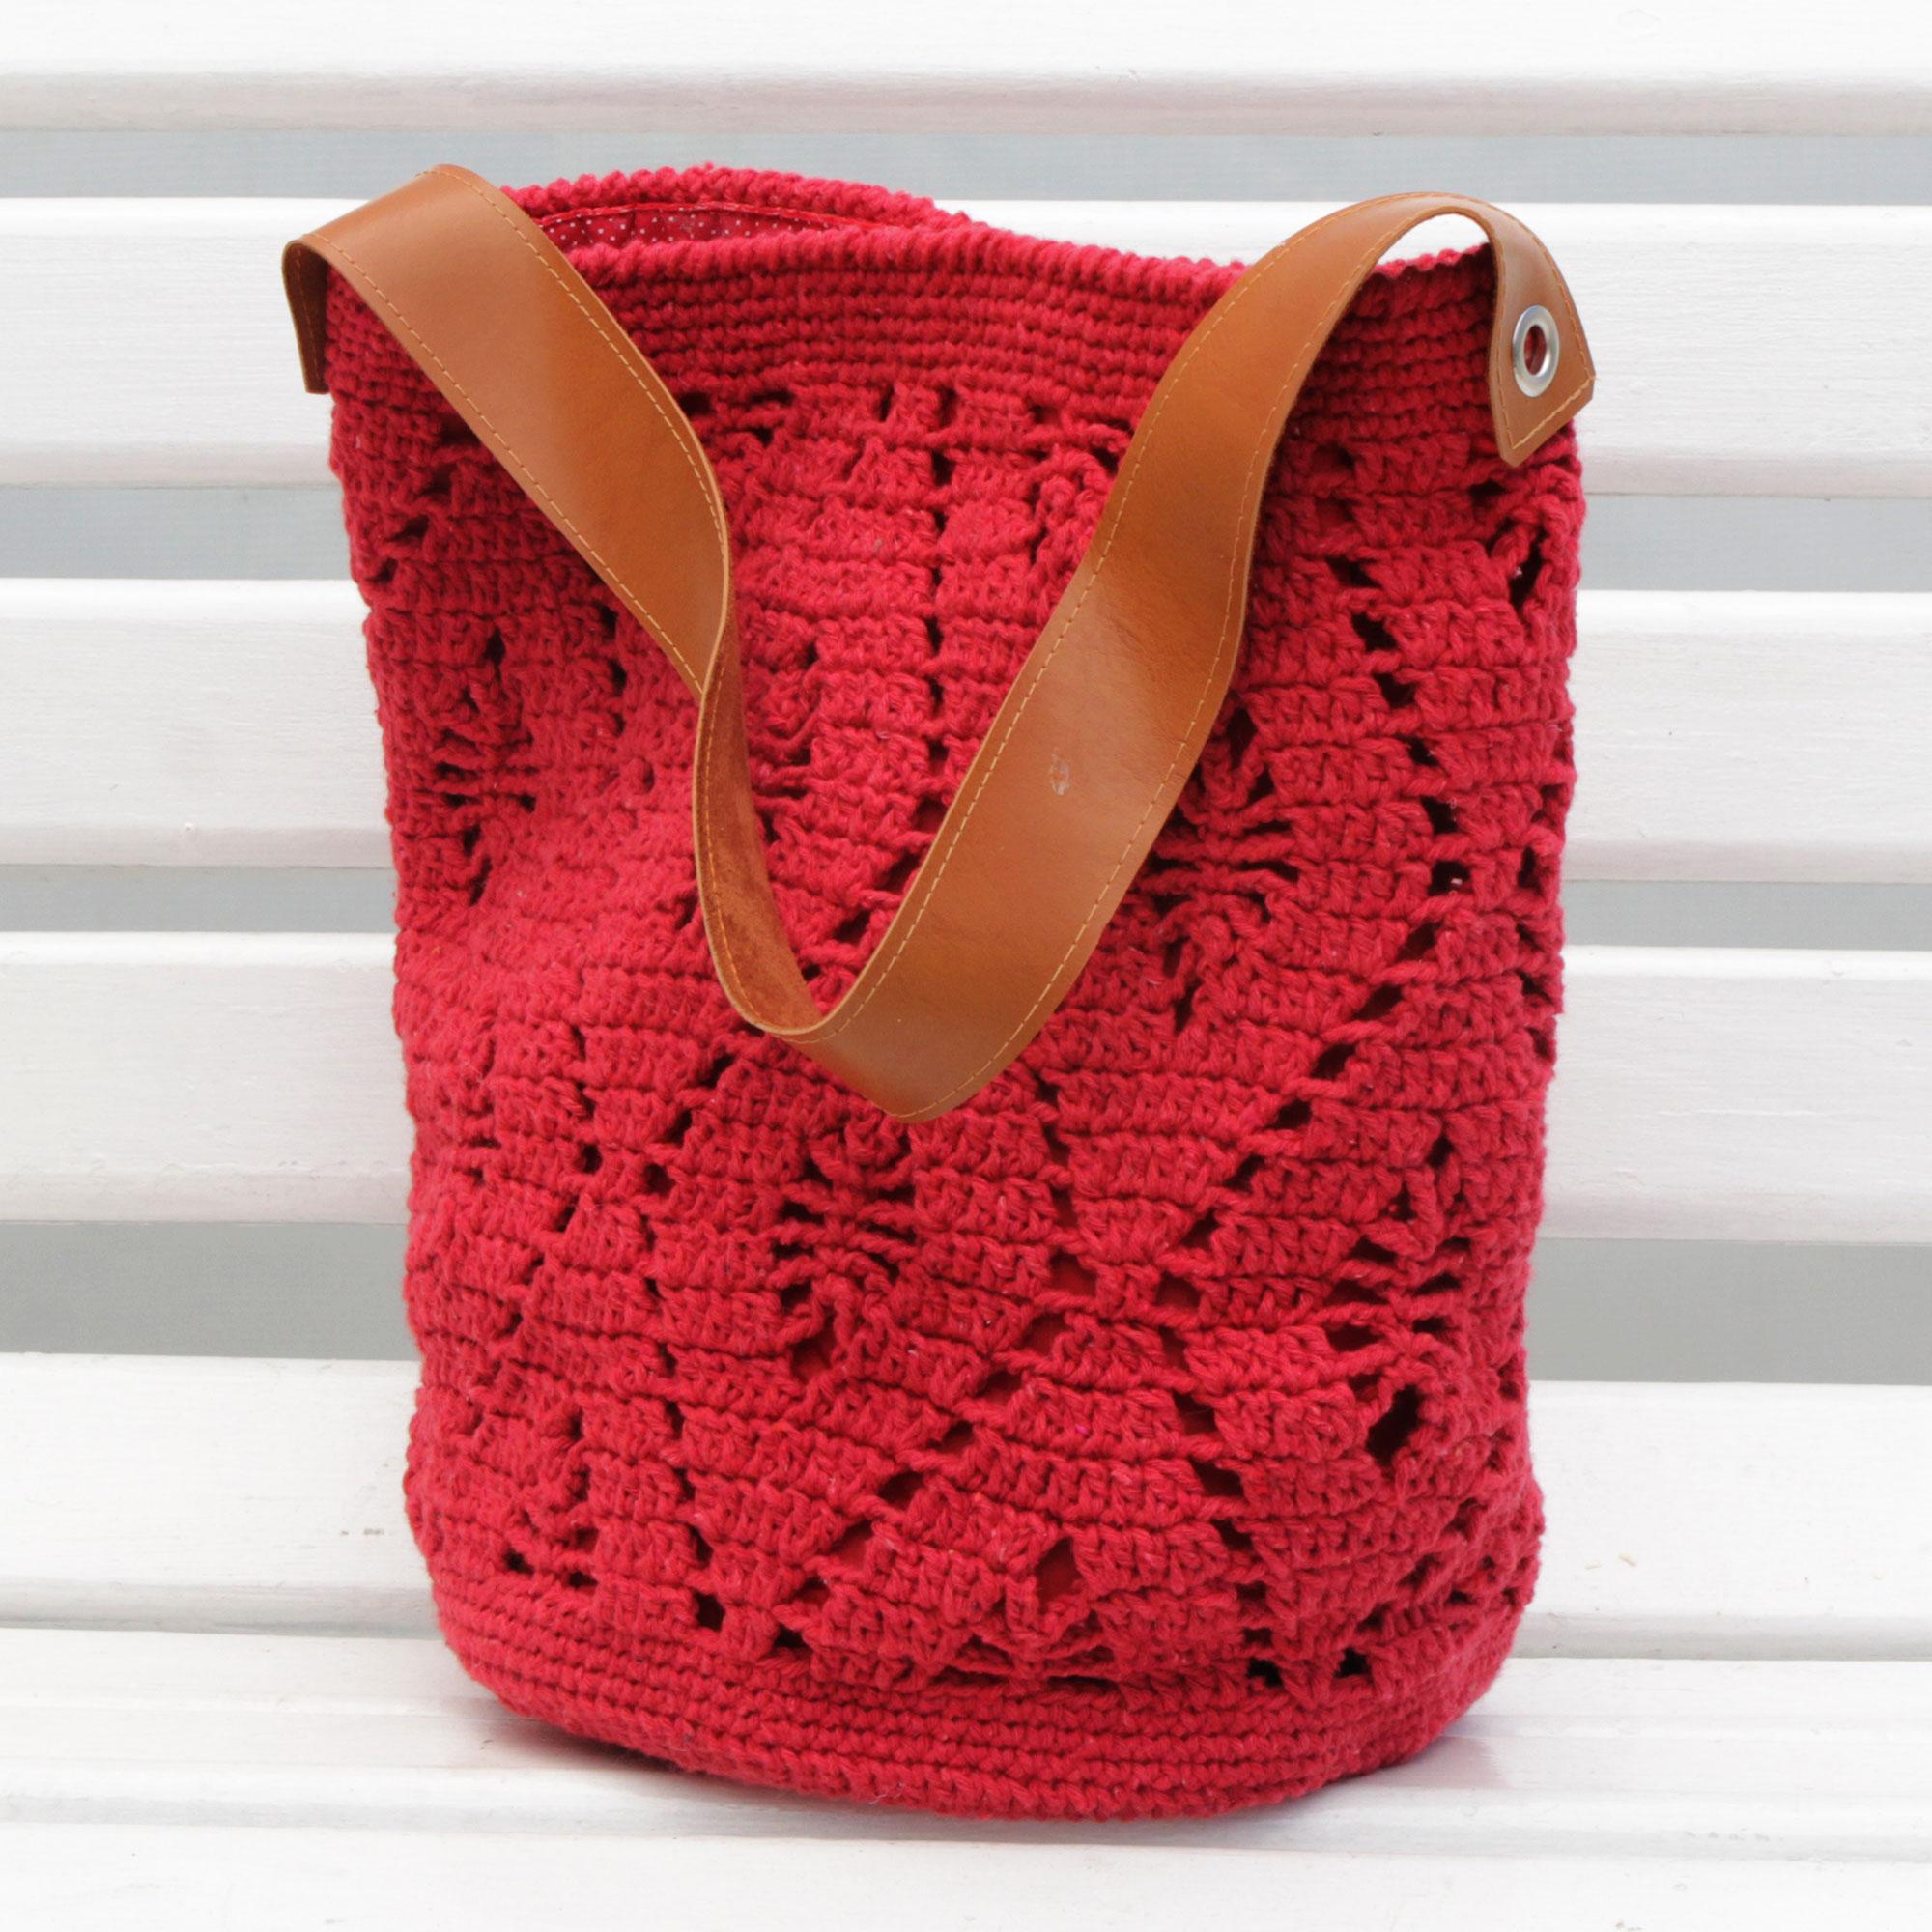 Crocheted Cotton Bucket Bag In Crimson From Brazil Diamond Crochet